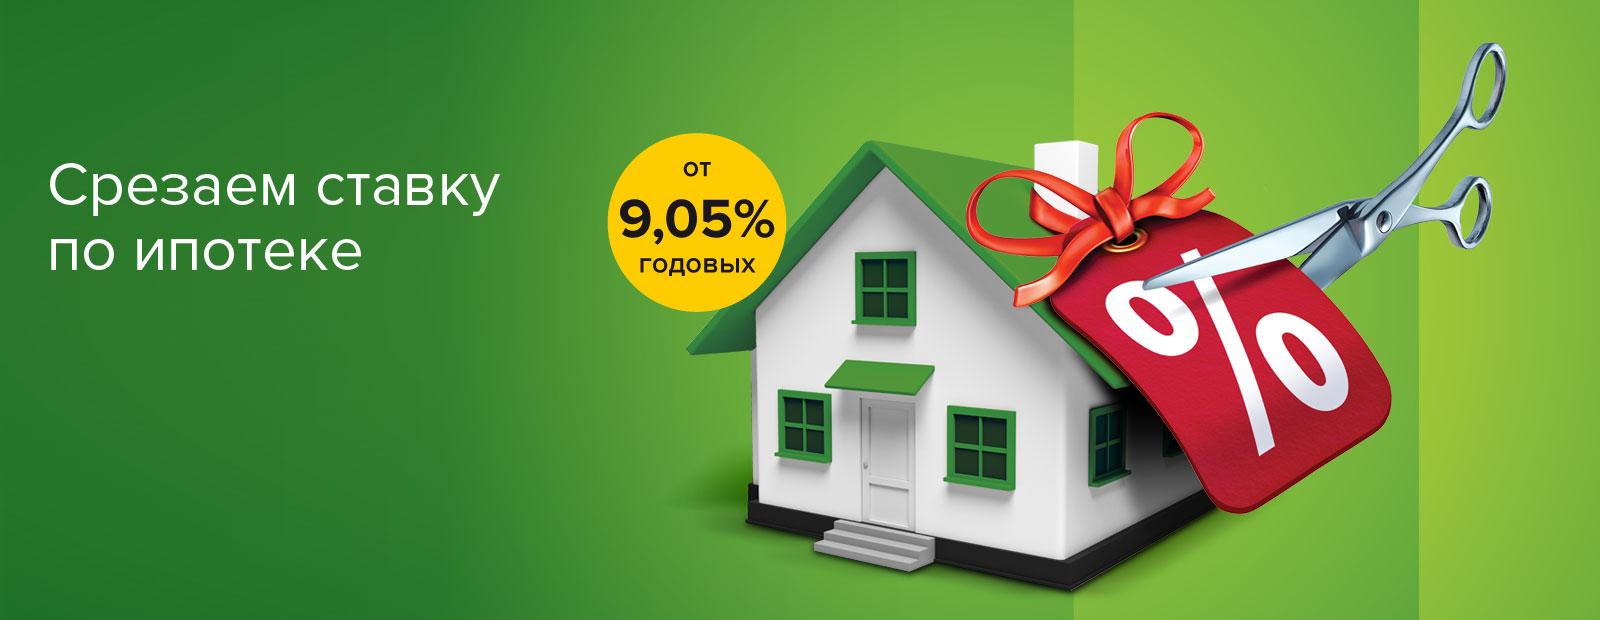 RSHB BNR Loan Ipoteka Refinance 1600x620 171130 - Кредит под залог недвижимости без доходов